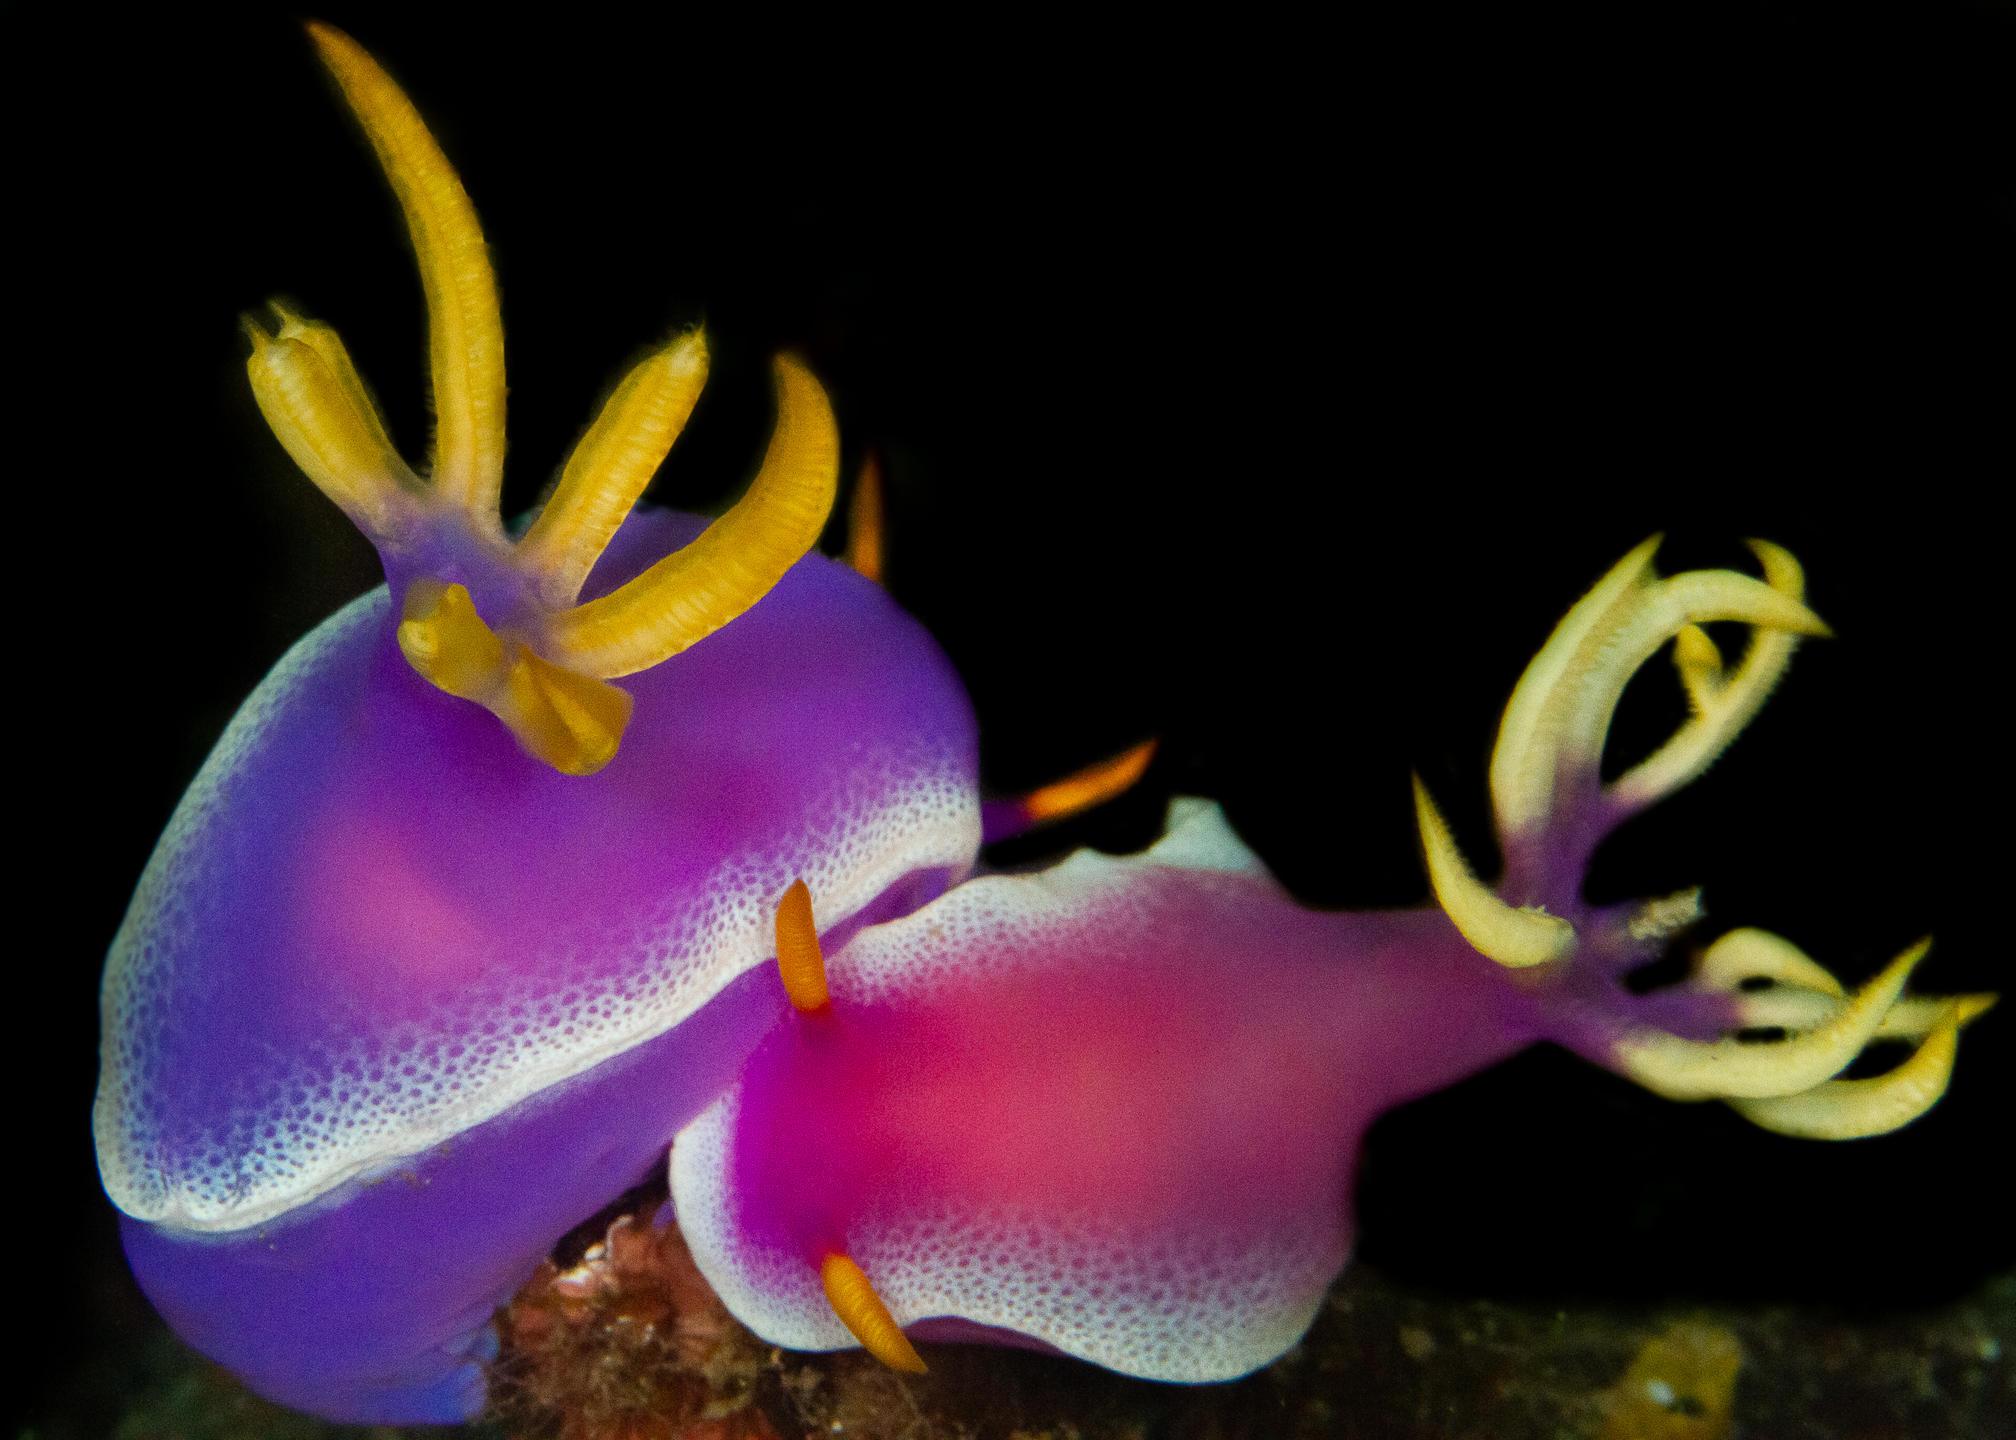 A pari of pink and yellow nudibranchs or sea slugs